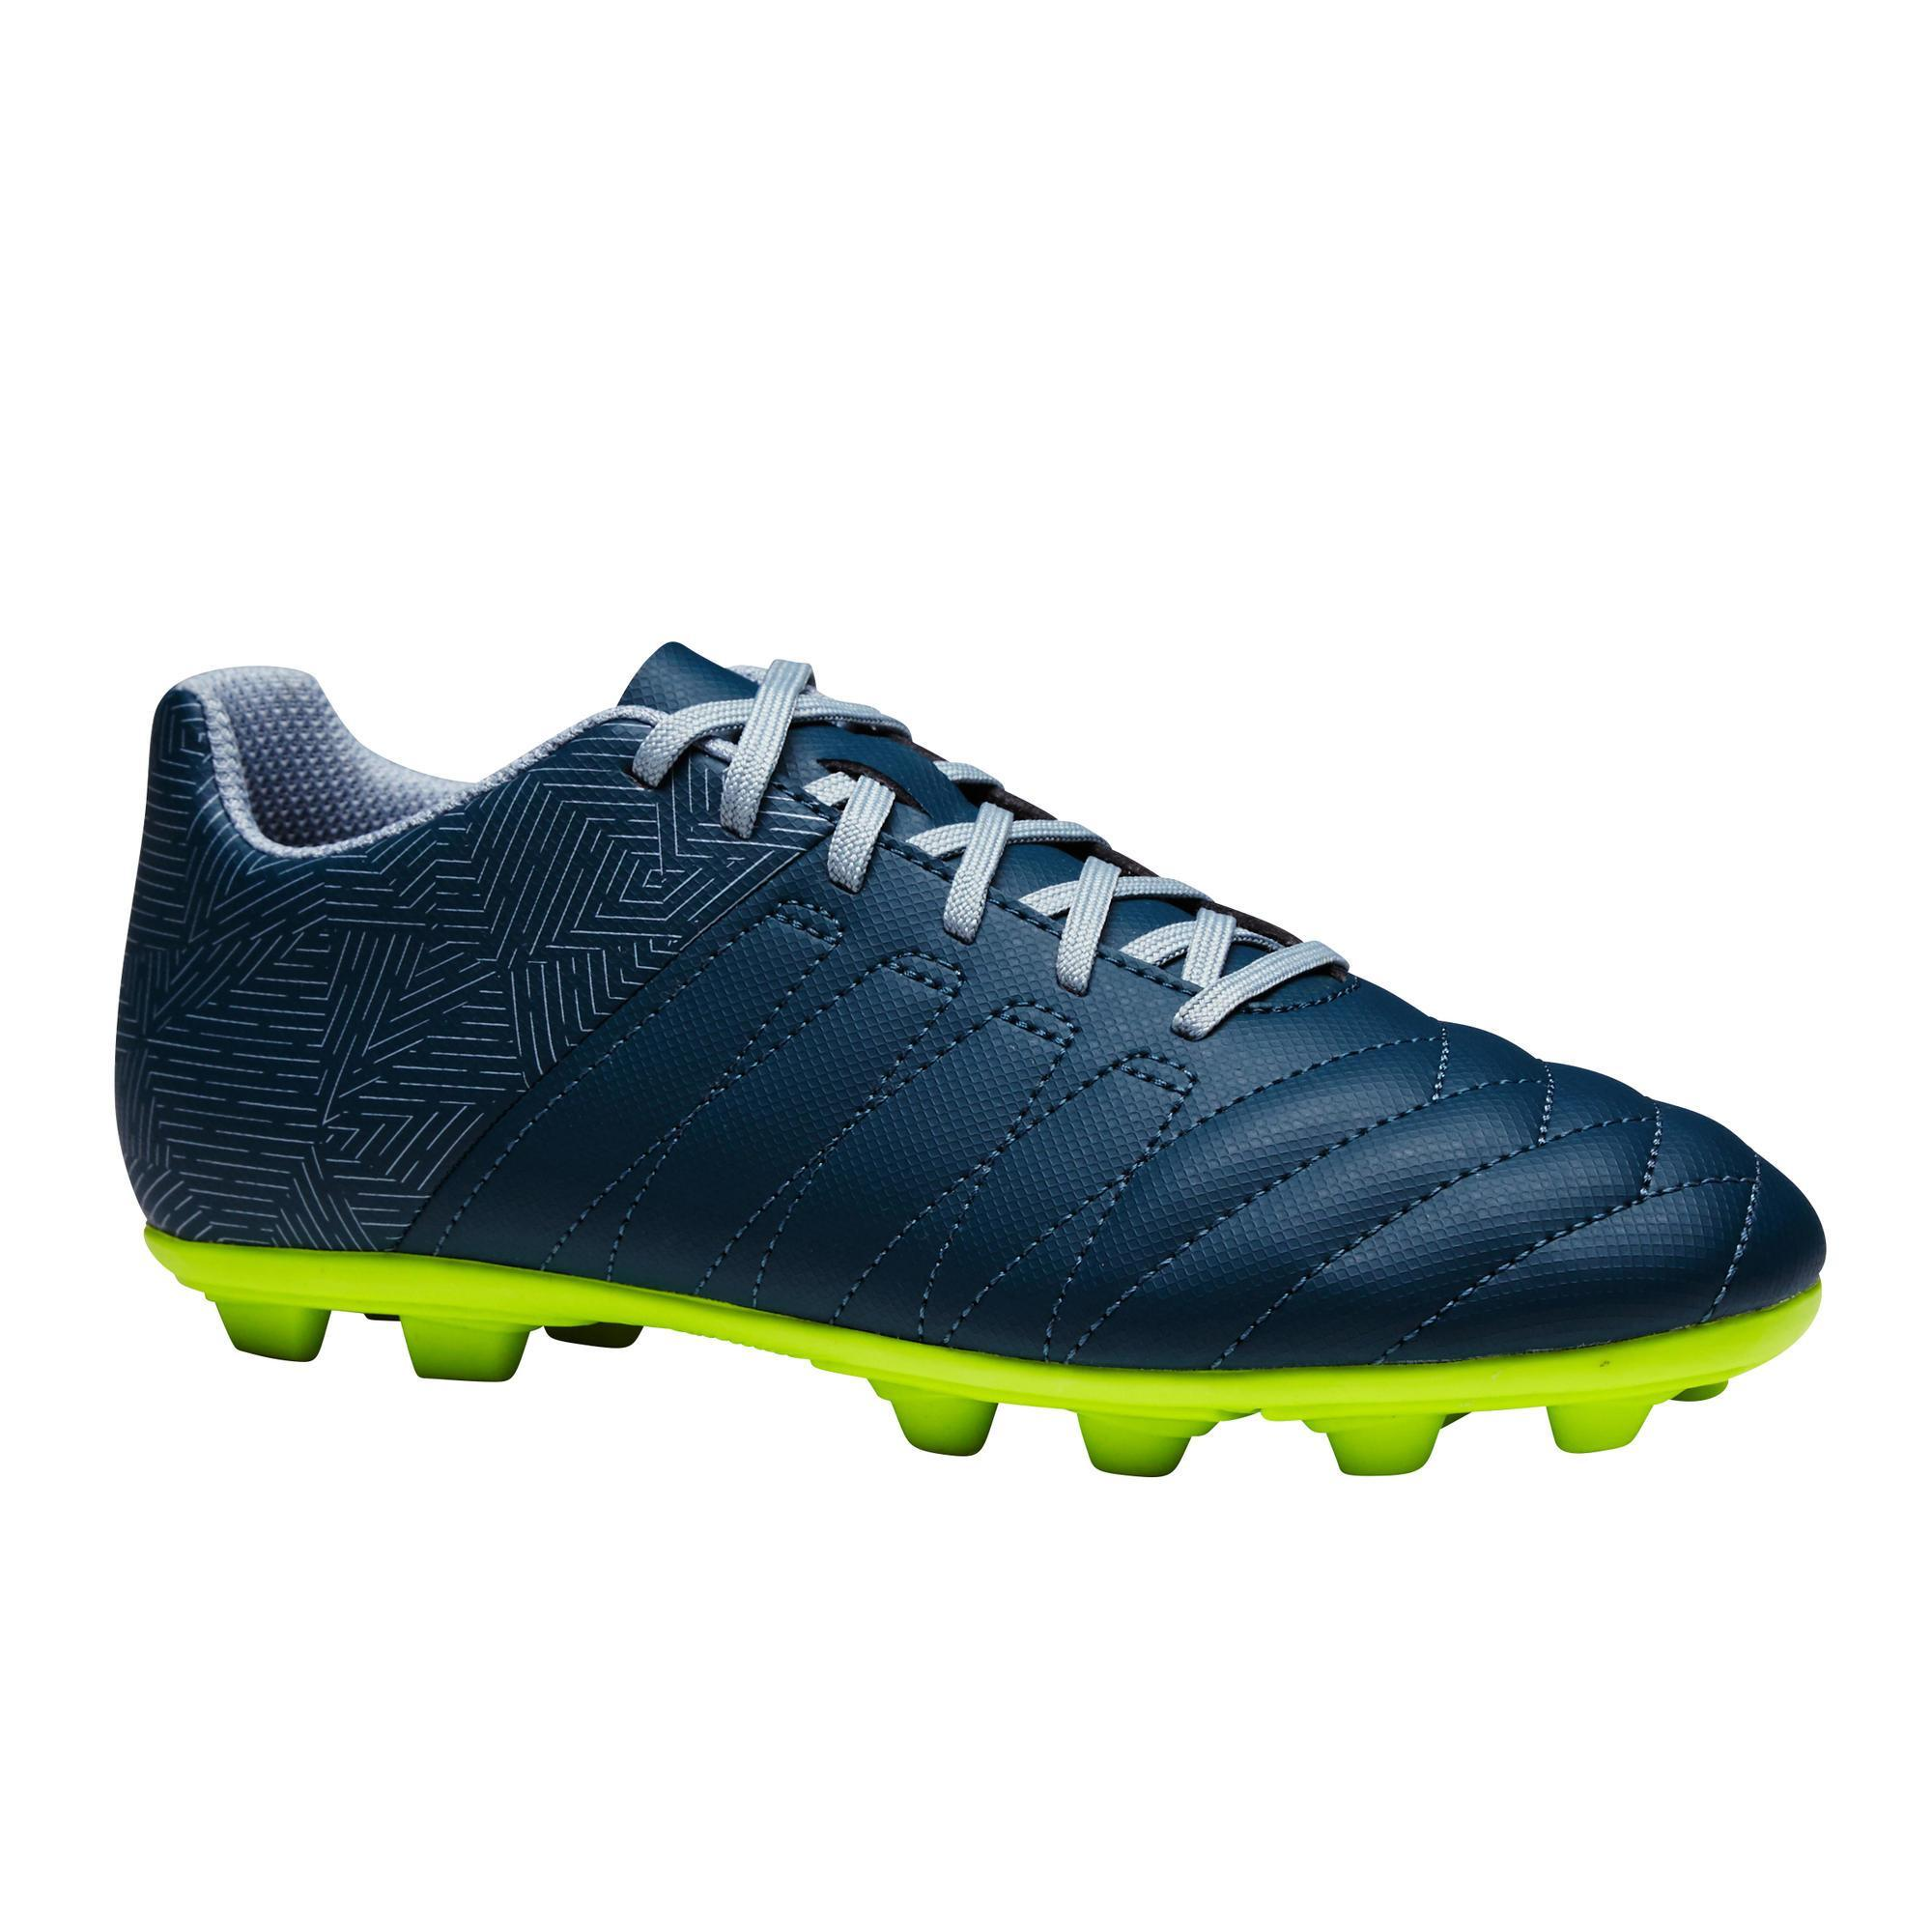 Kipsta Voetbalschoenen kind Agility 300 FG blauw/geel